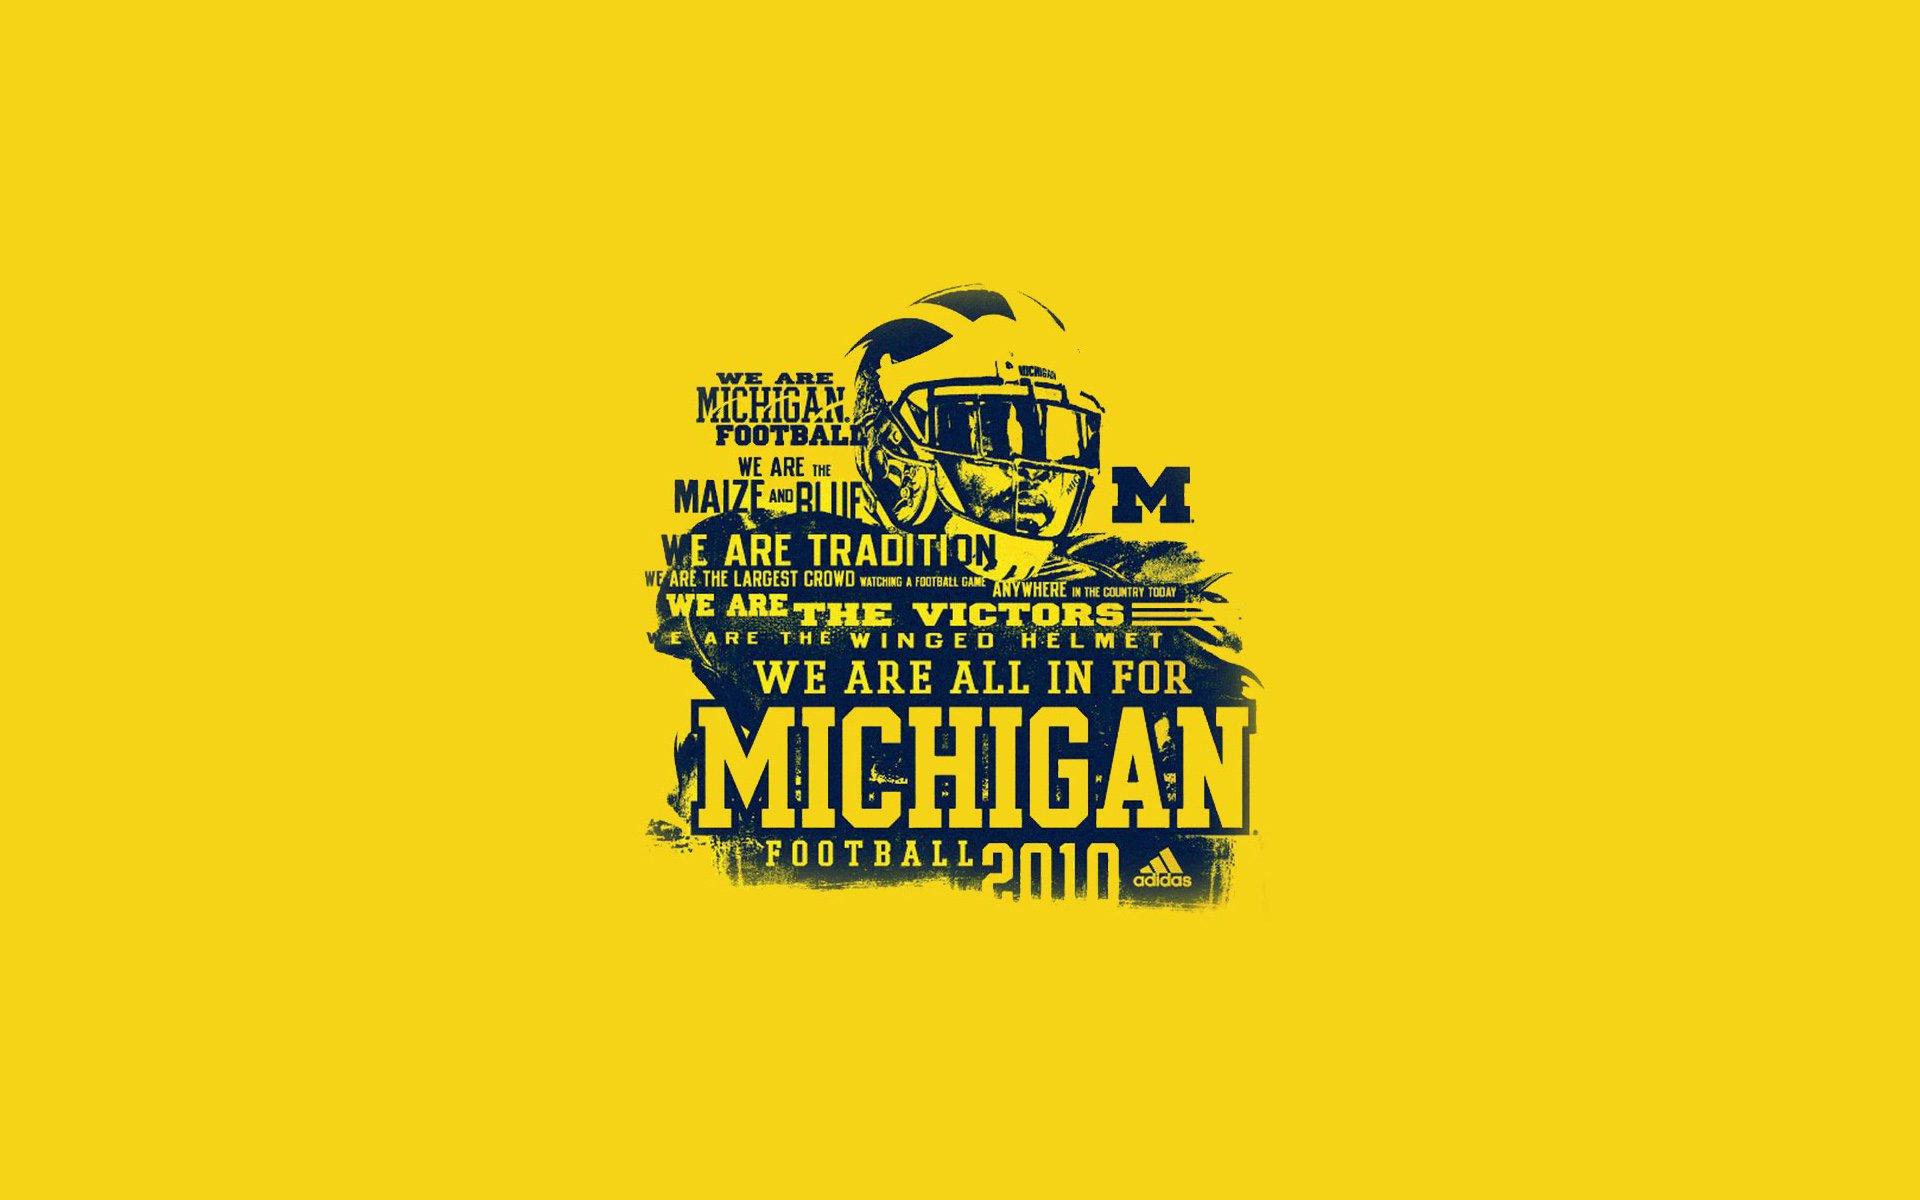 Michigan Football Schedule Wallpaper